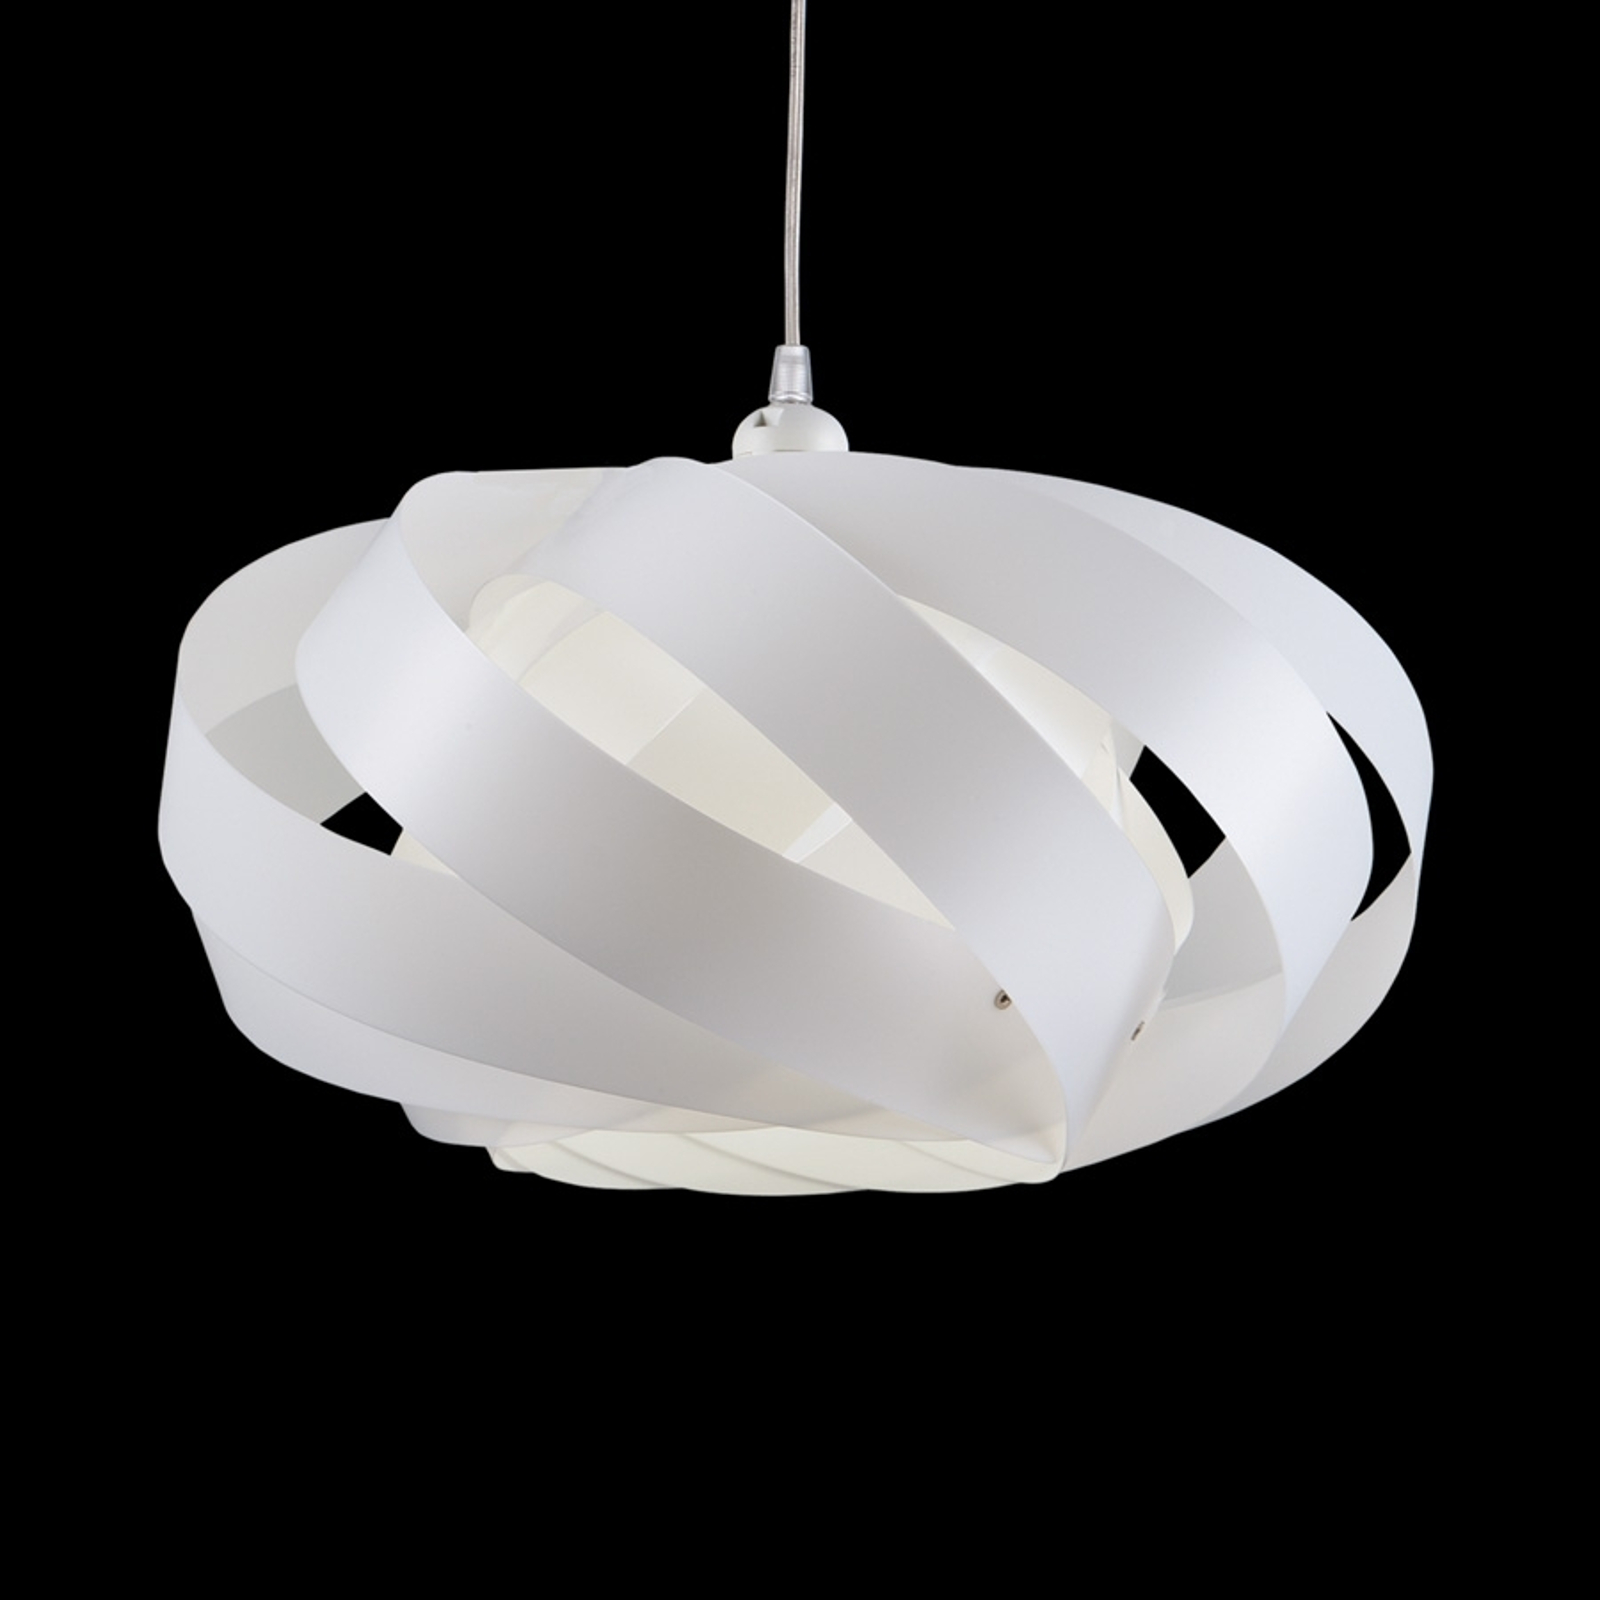 Lámpara colgante Mininest de rayas, blanco